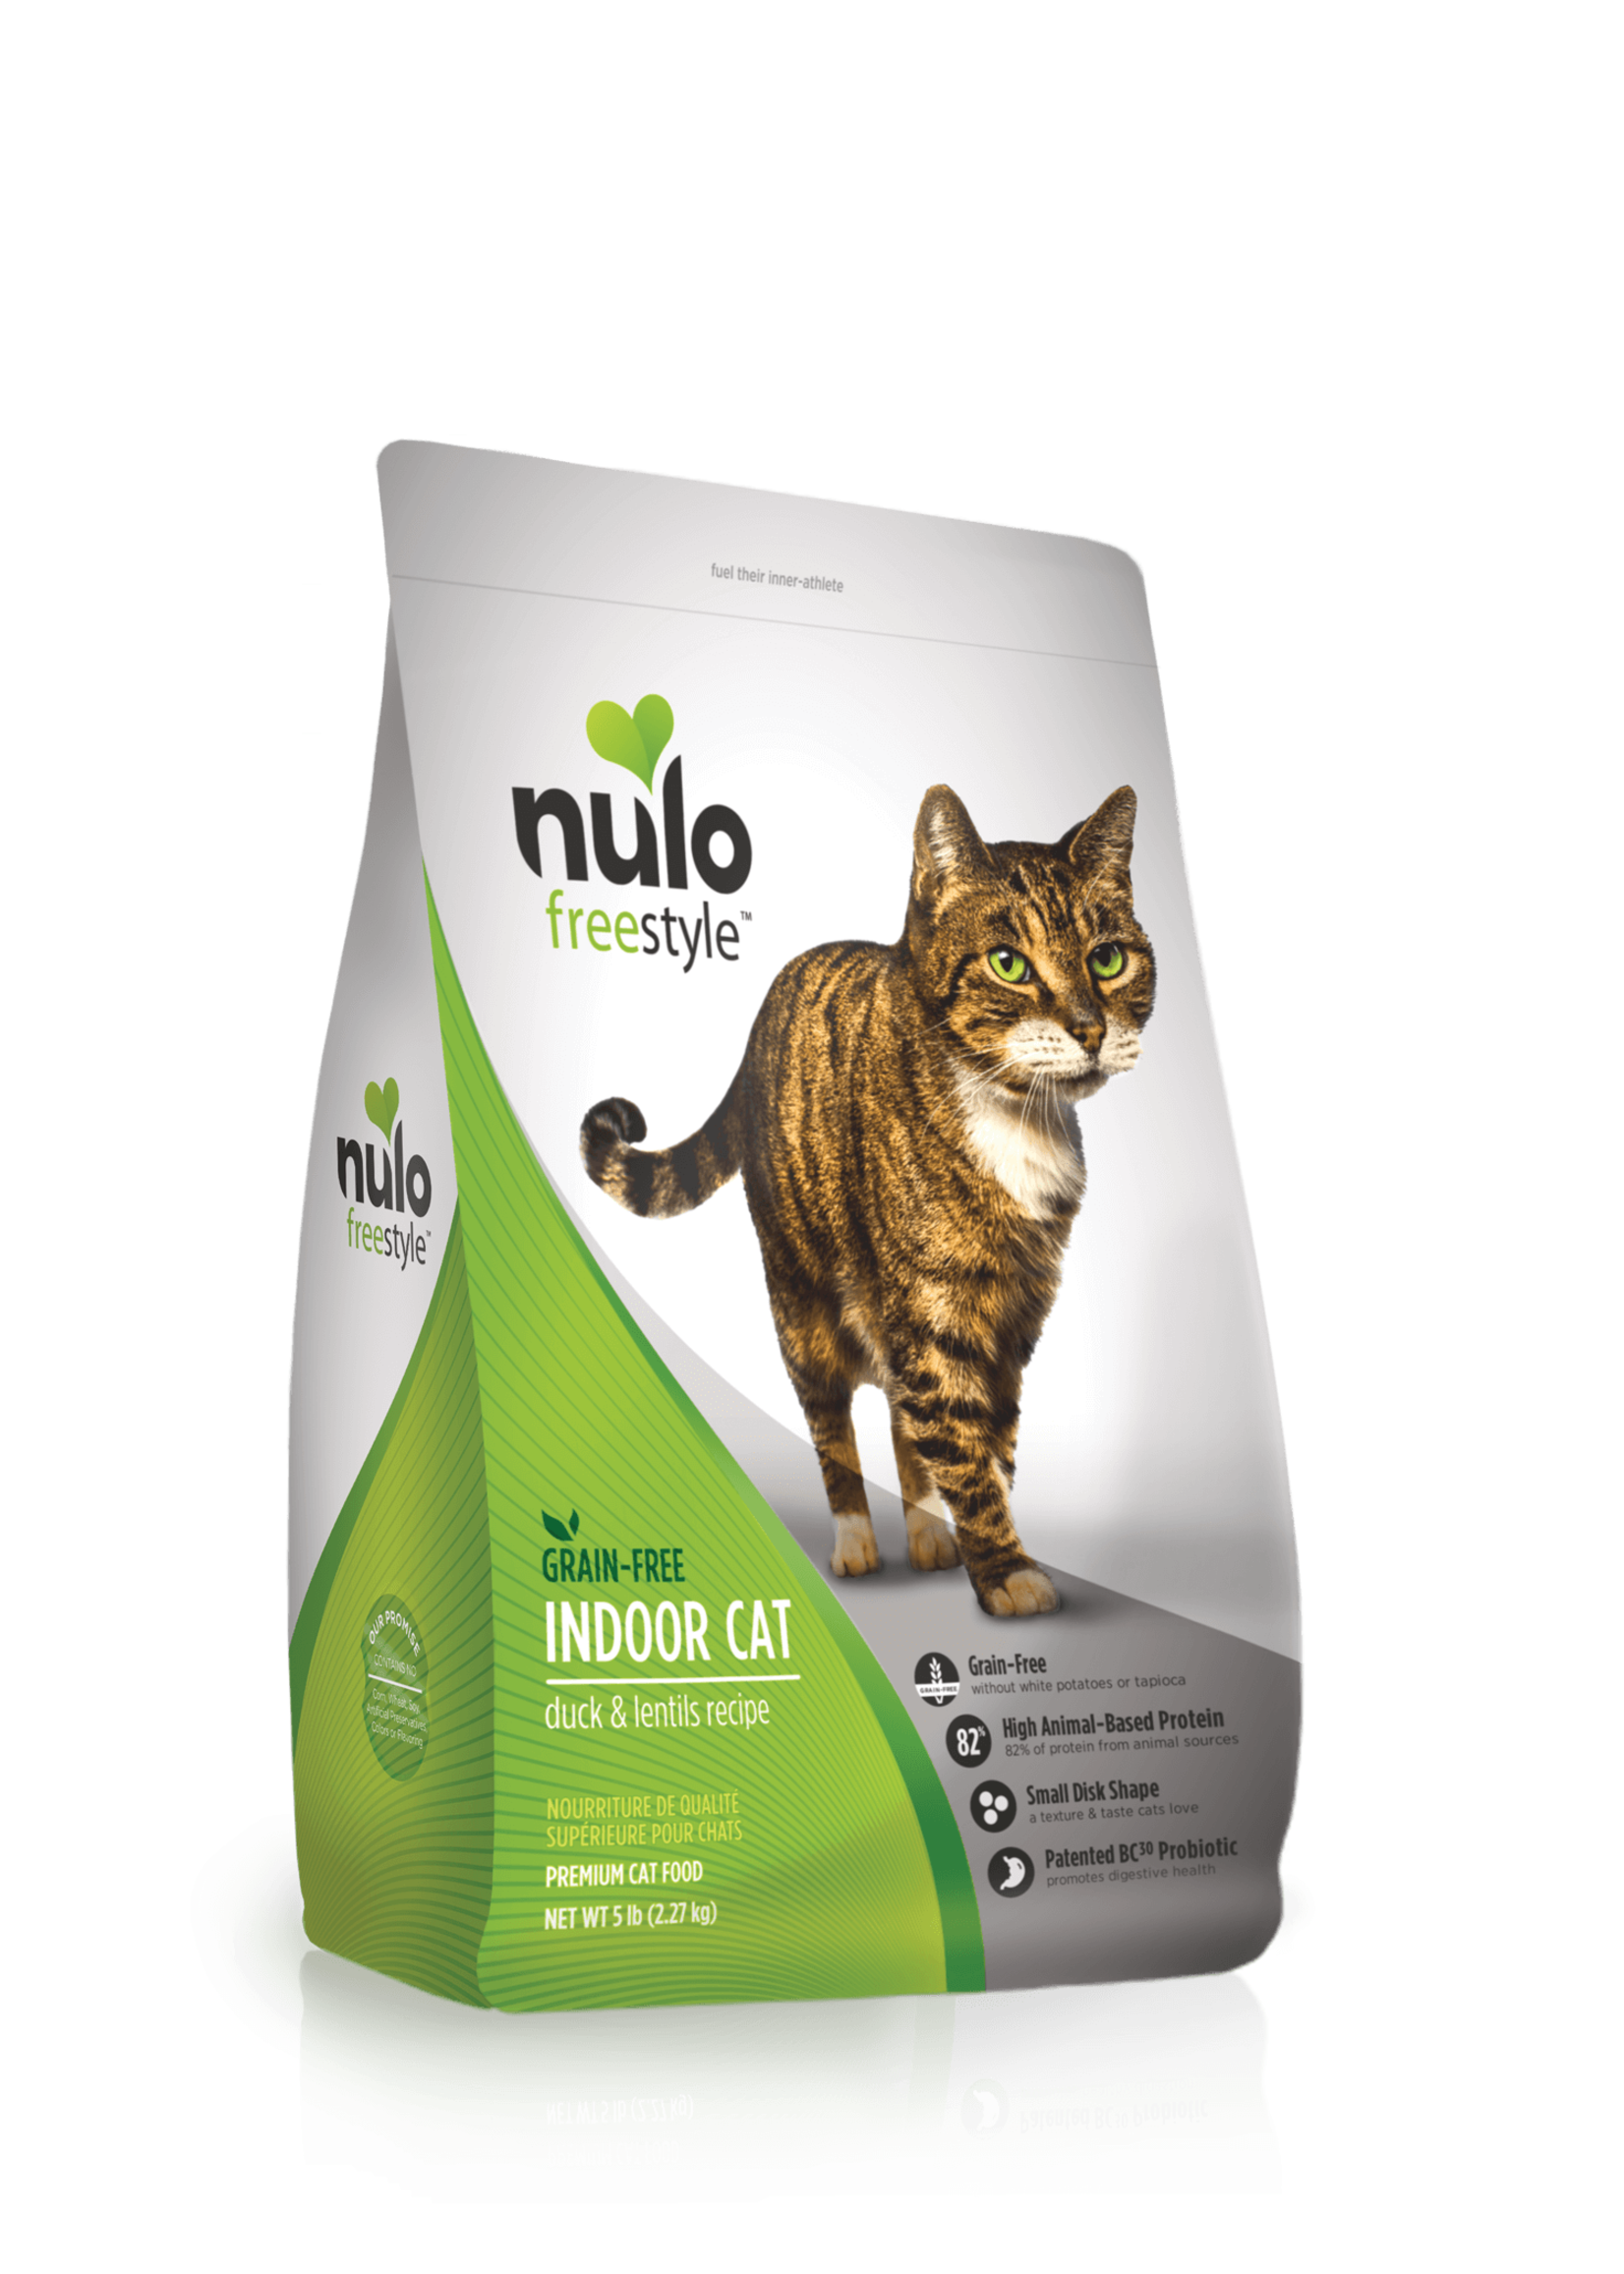 Nulo Nulo FreeStyle Grain Free Indoor Cat Food Duck & Lentils, 5lb Bag